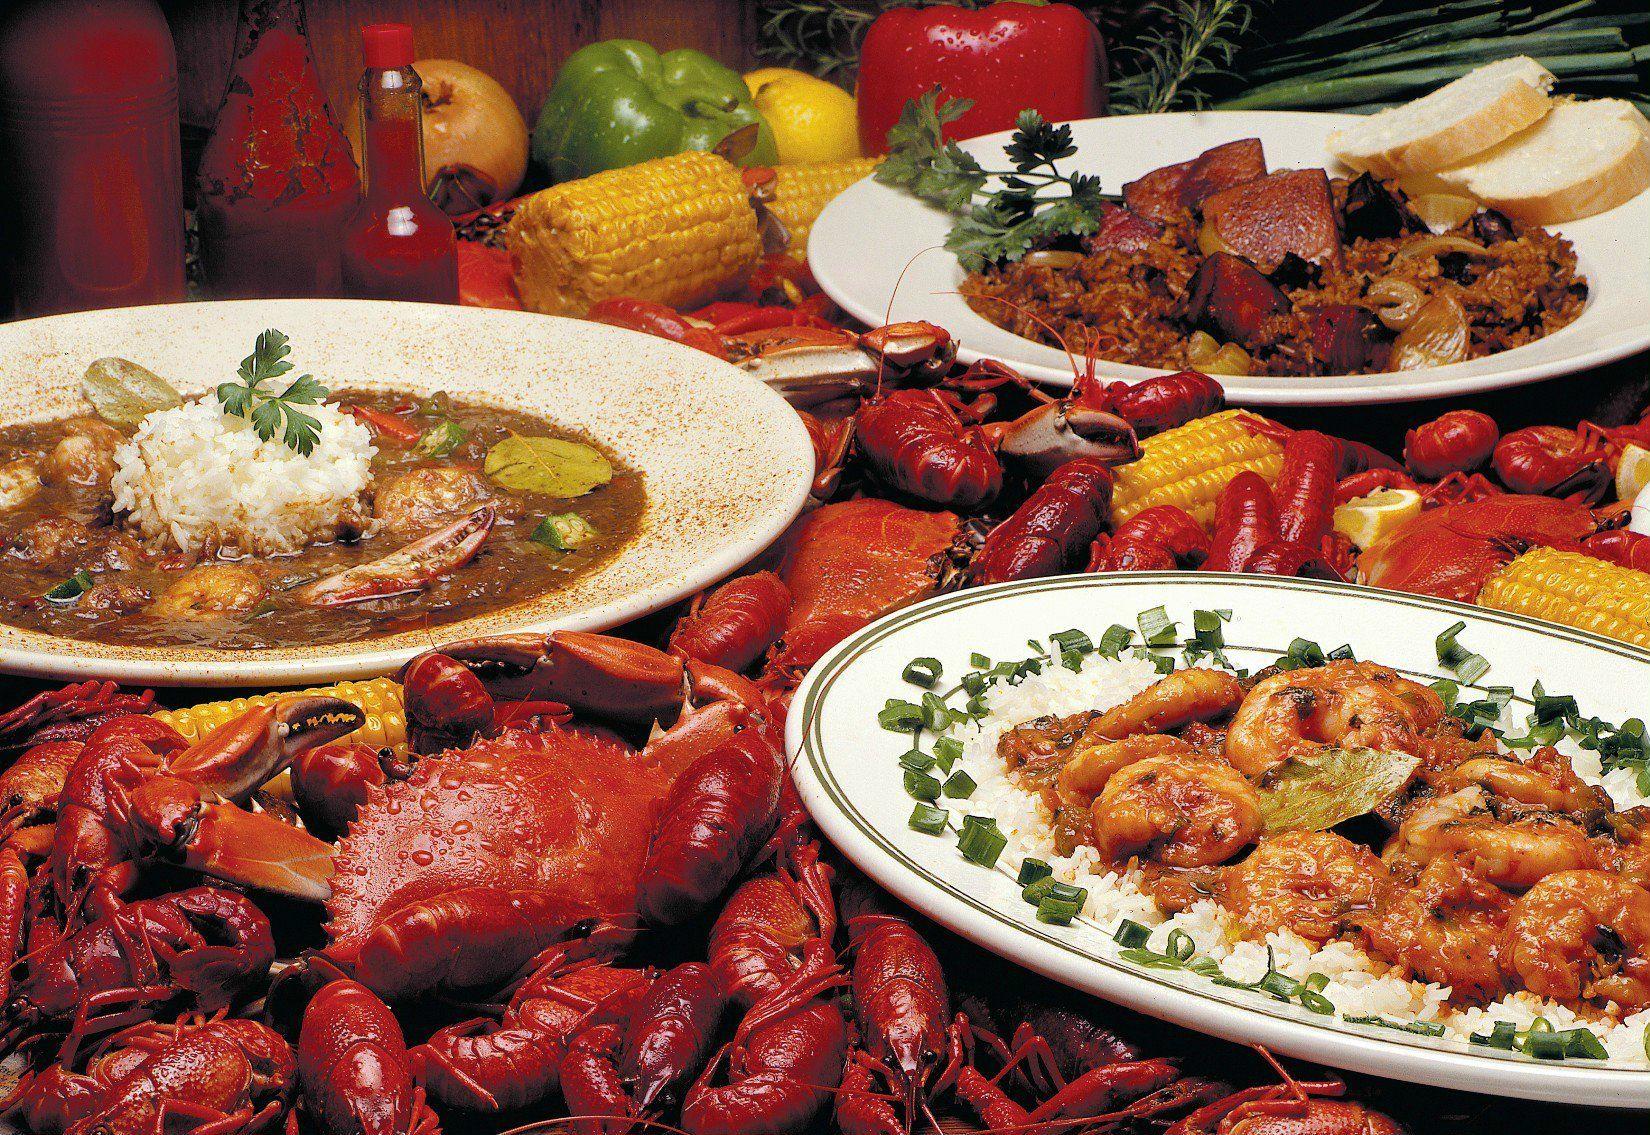 cajun-food-cooking